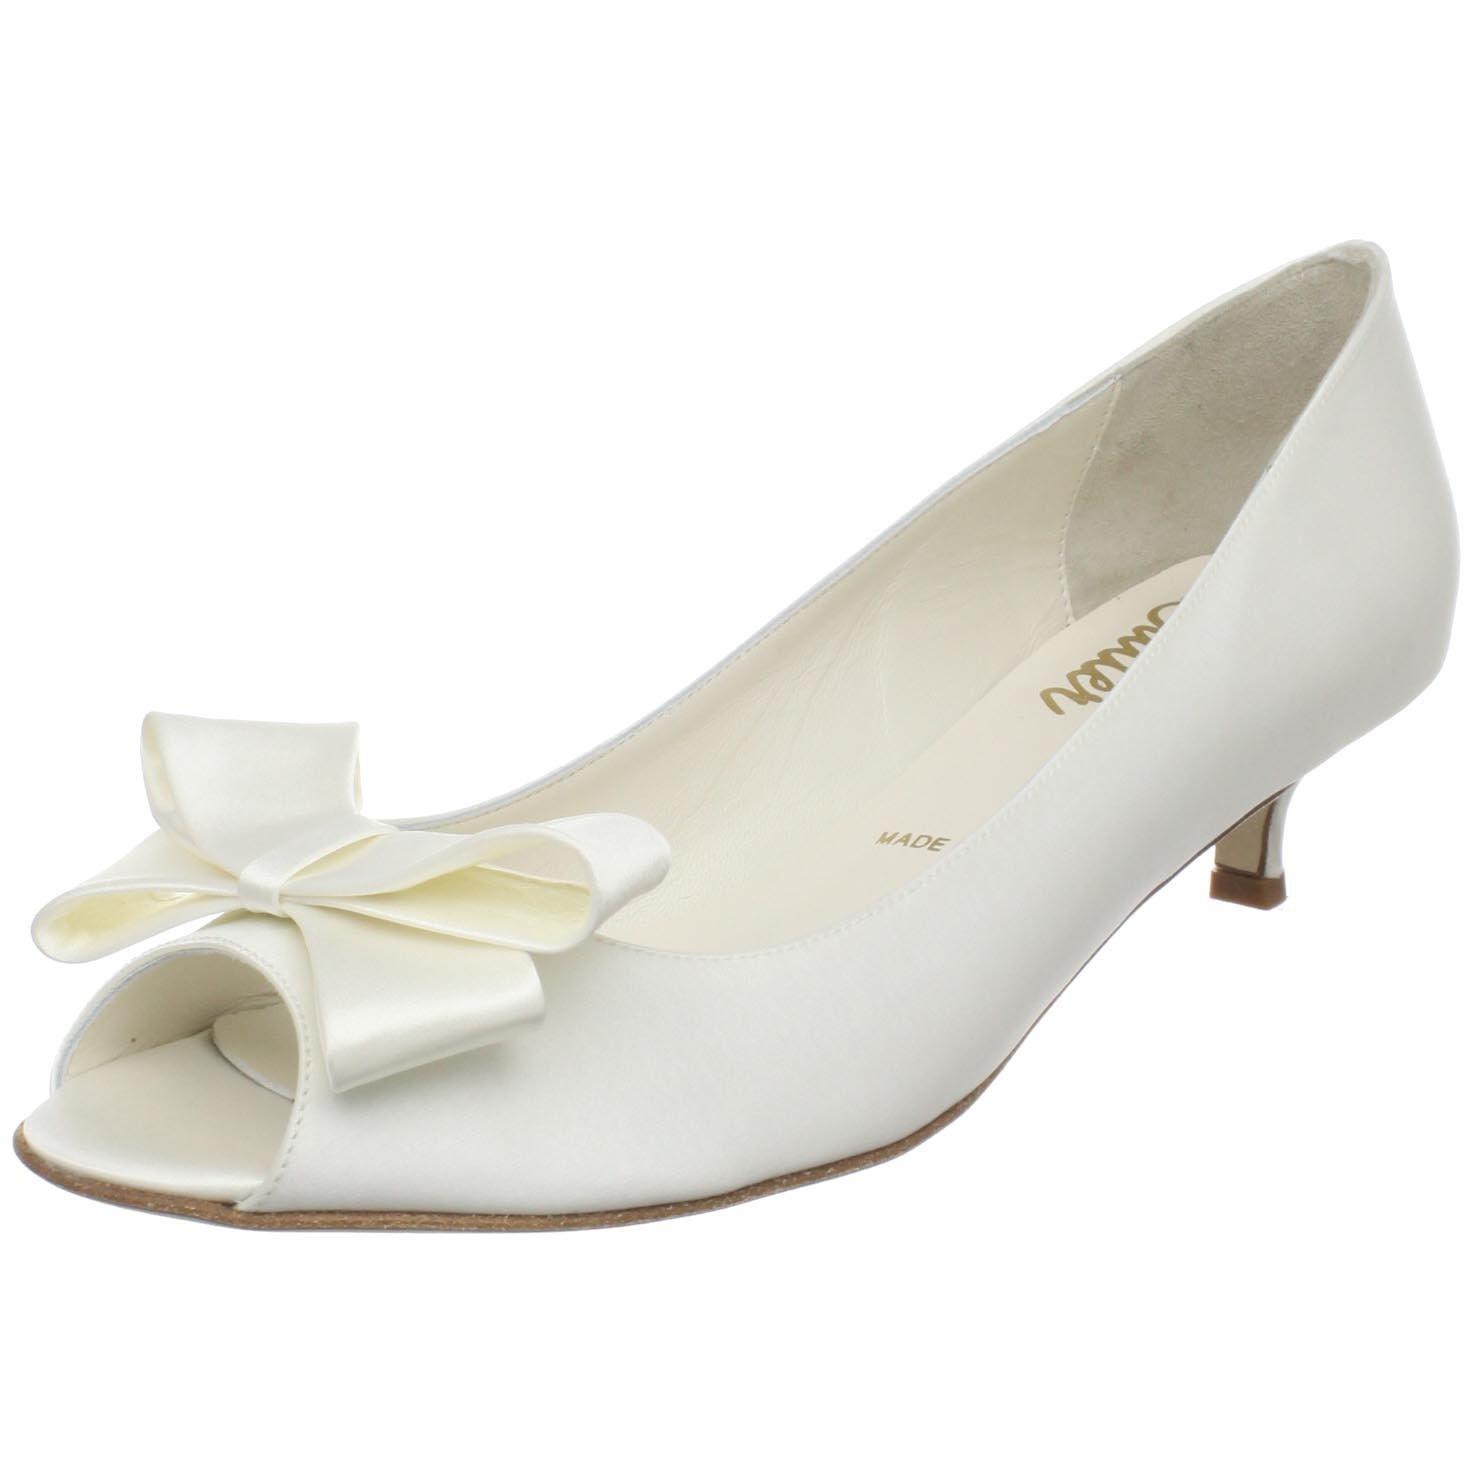 wedding kitten heel shoes photo - 1